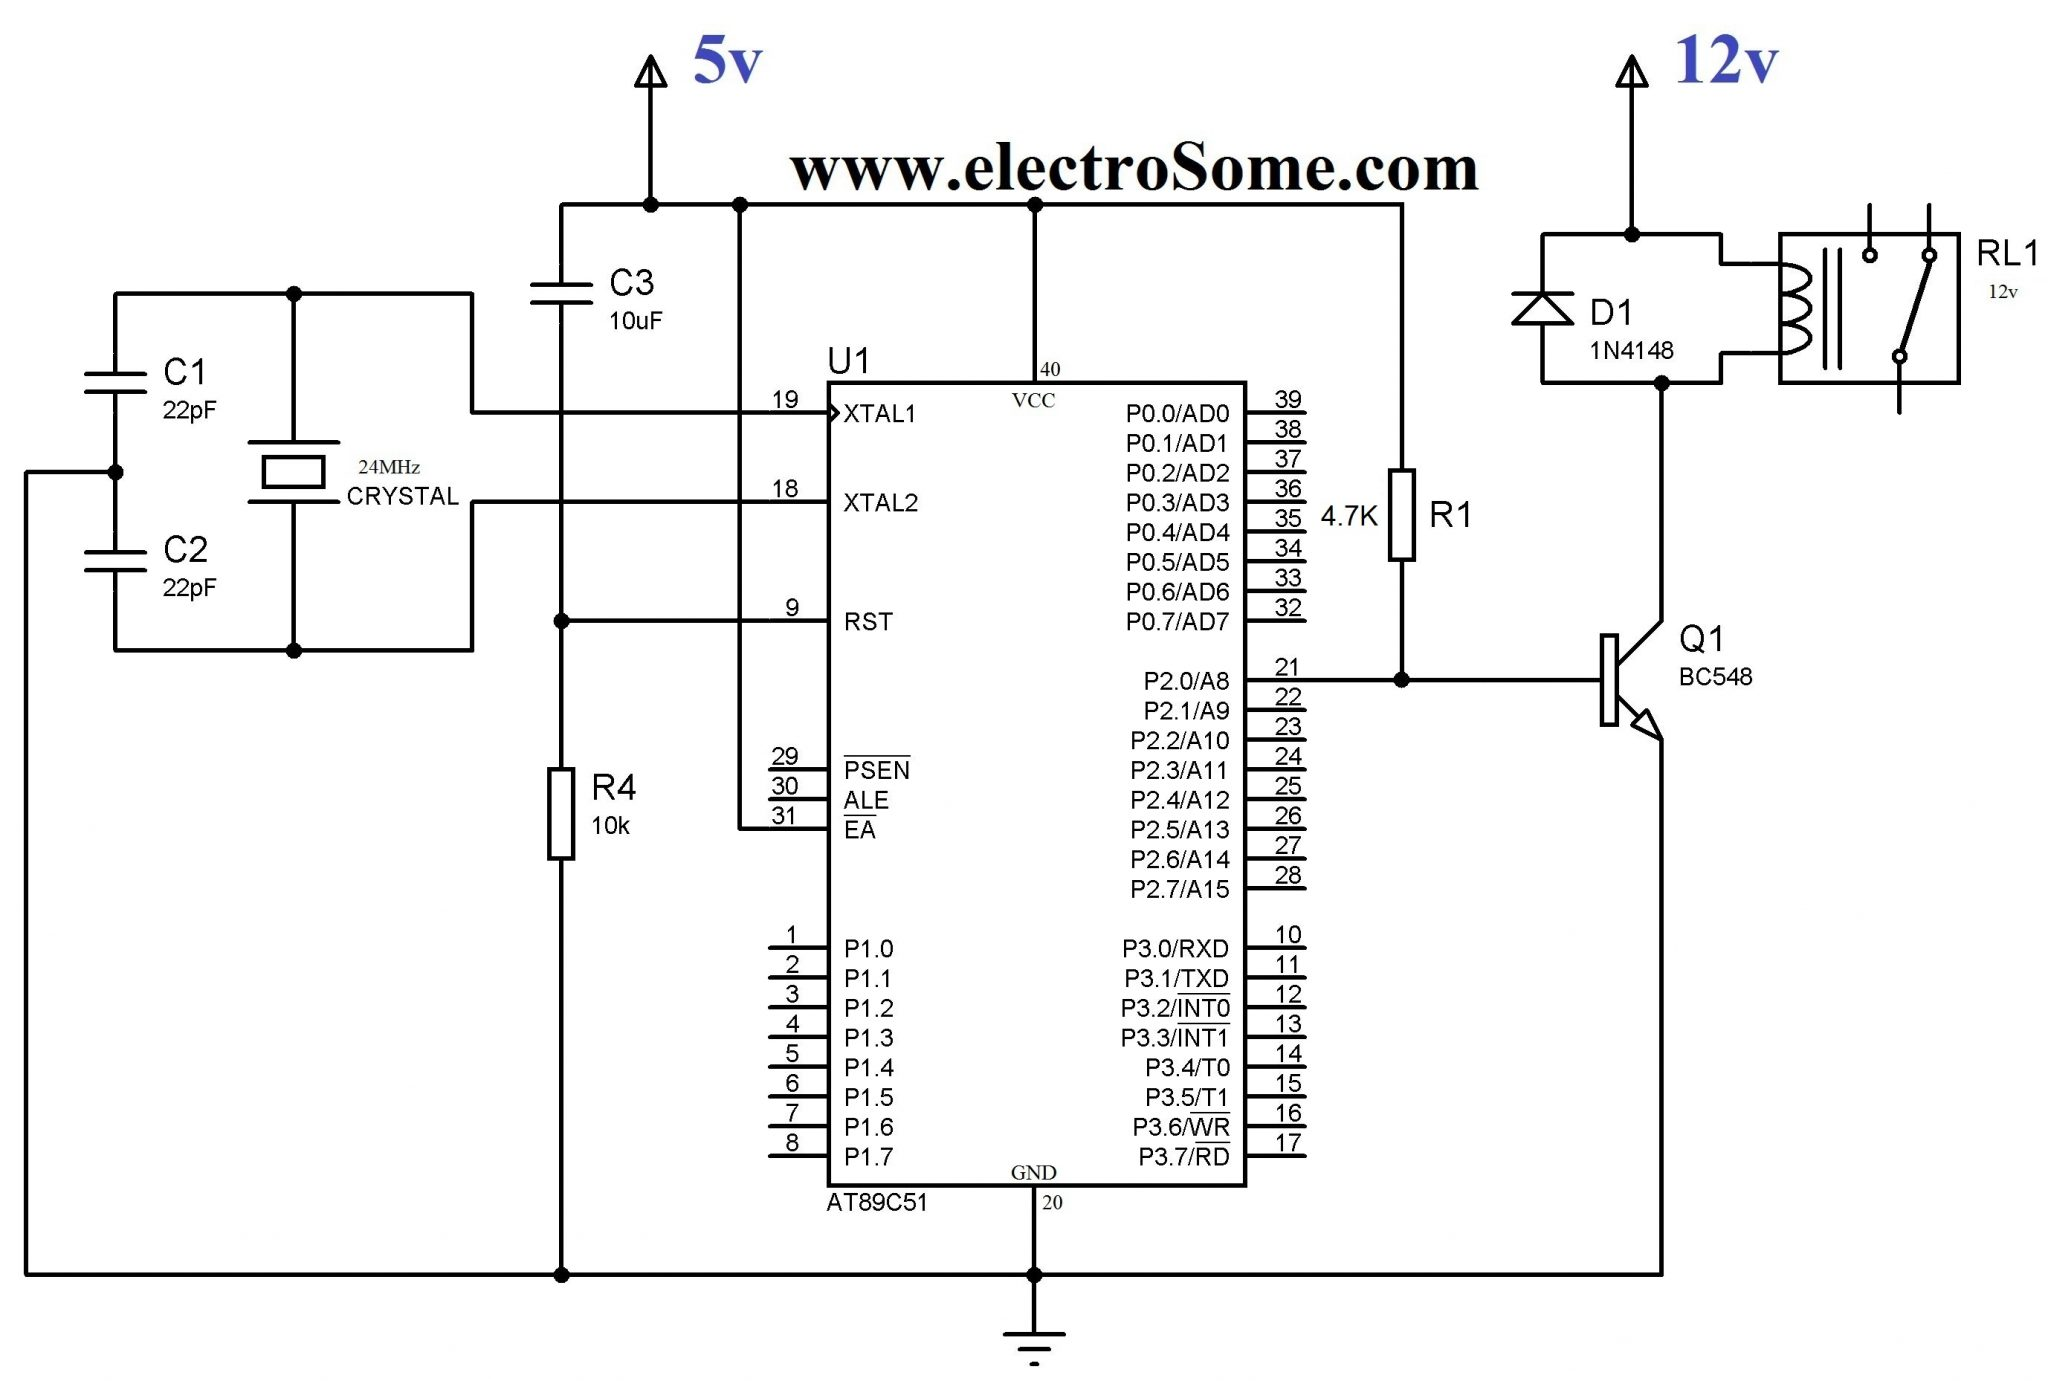 wiring diagram symbol for relay cam sensor interfacing with 8051 using keil c at89c51